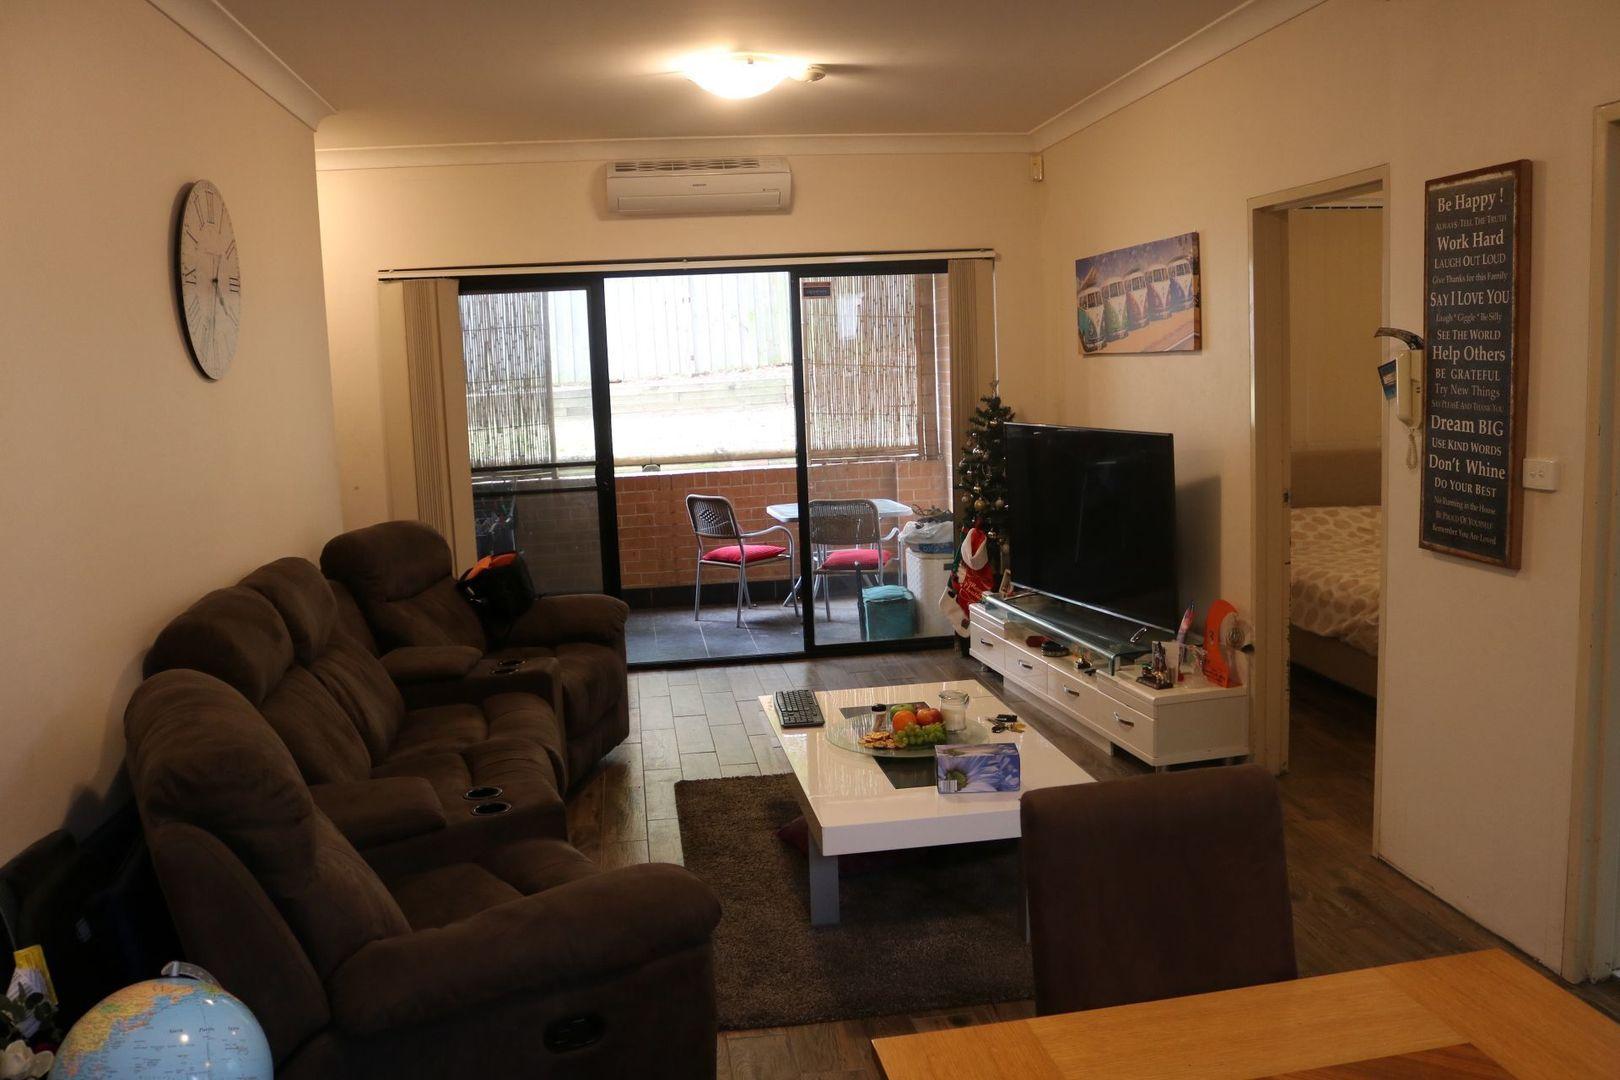 14/43-49 Bowden Street, Harris Park NSW 2150, Image 0